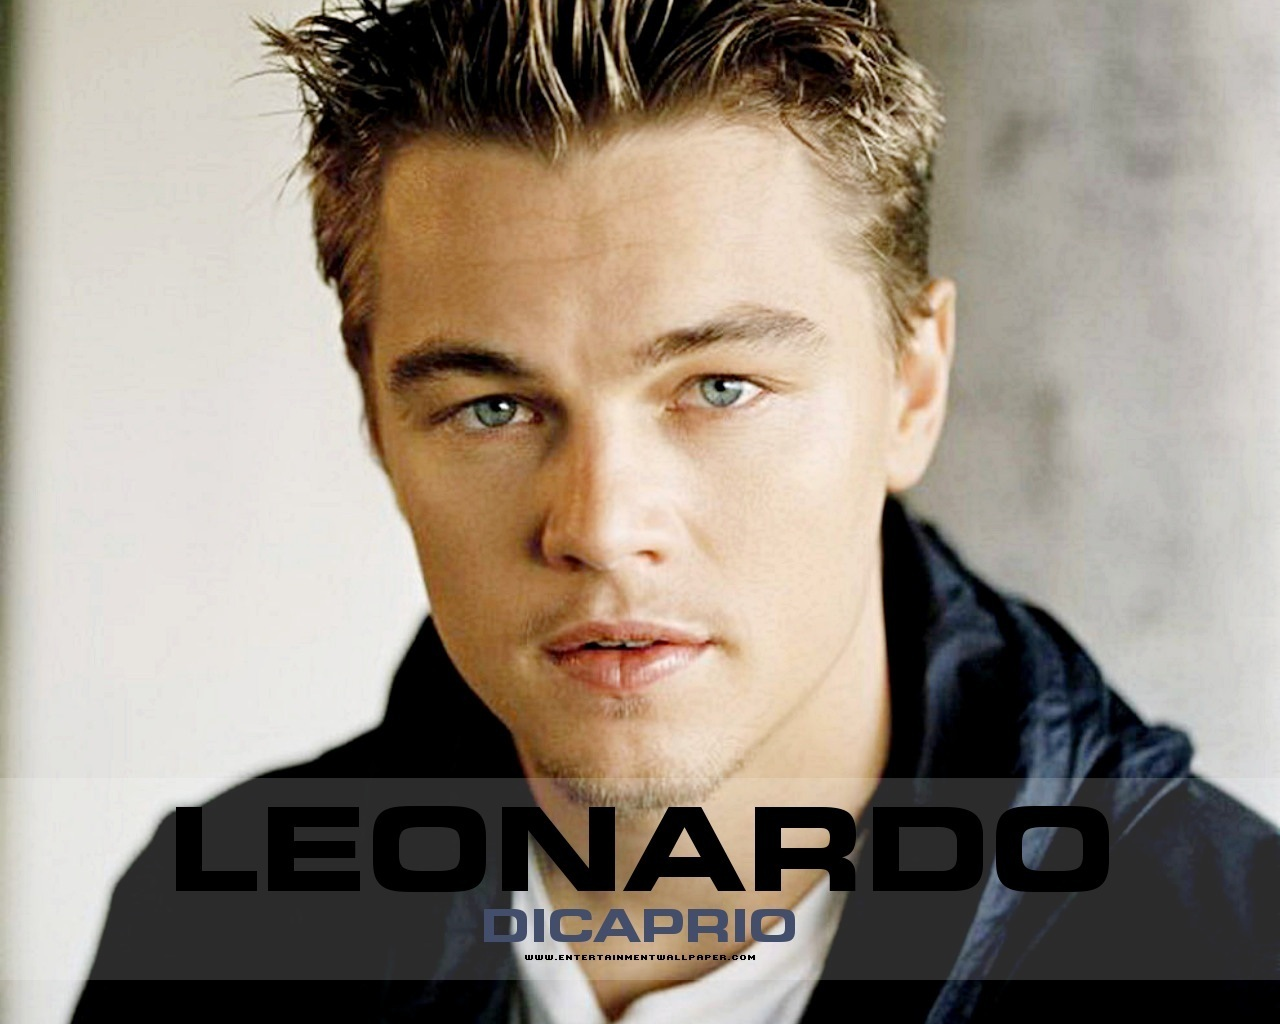 http://2.bp.blogspot.com/_MMag0JteG7w/TSL_0AIzegI/AAAAAAAAAME/Oe_312URVLo/s1600/Leonardo-DiCaprio-leonardo-dicaprio-16946706-1280-1024.jpg